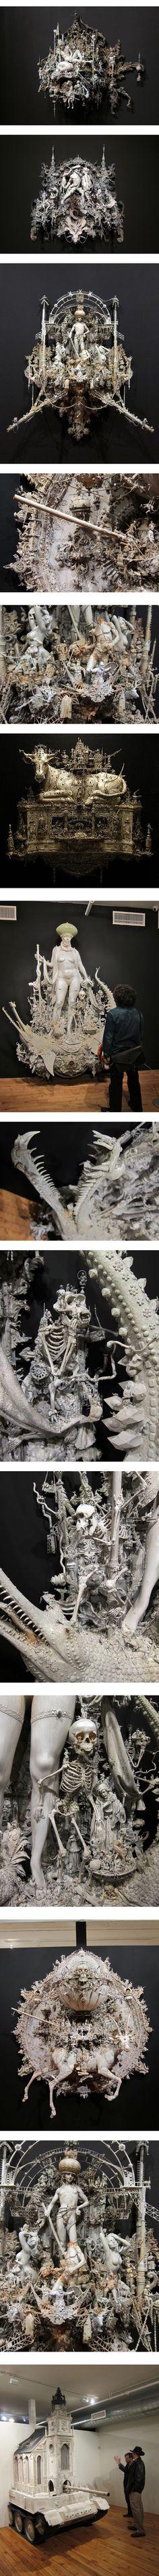 Fantasy | Whimsical | Strange | Mythical | Creative | Creatures | Dolls | Sculptures | ☥ | Kris Kuksi sculpture